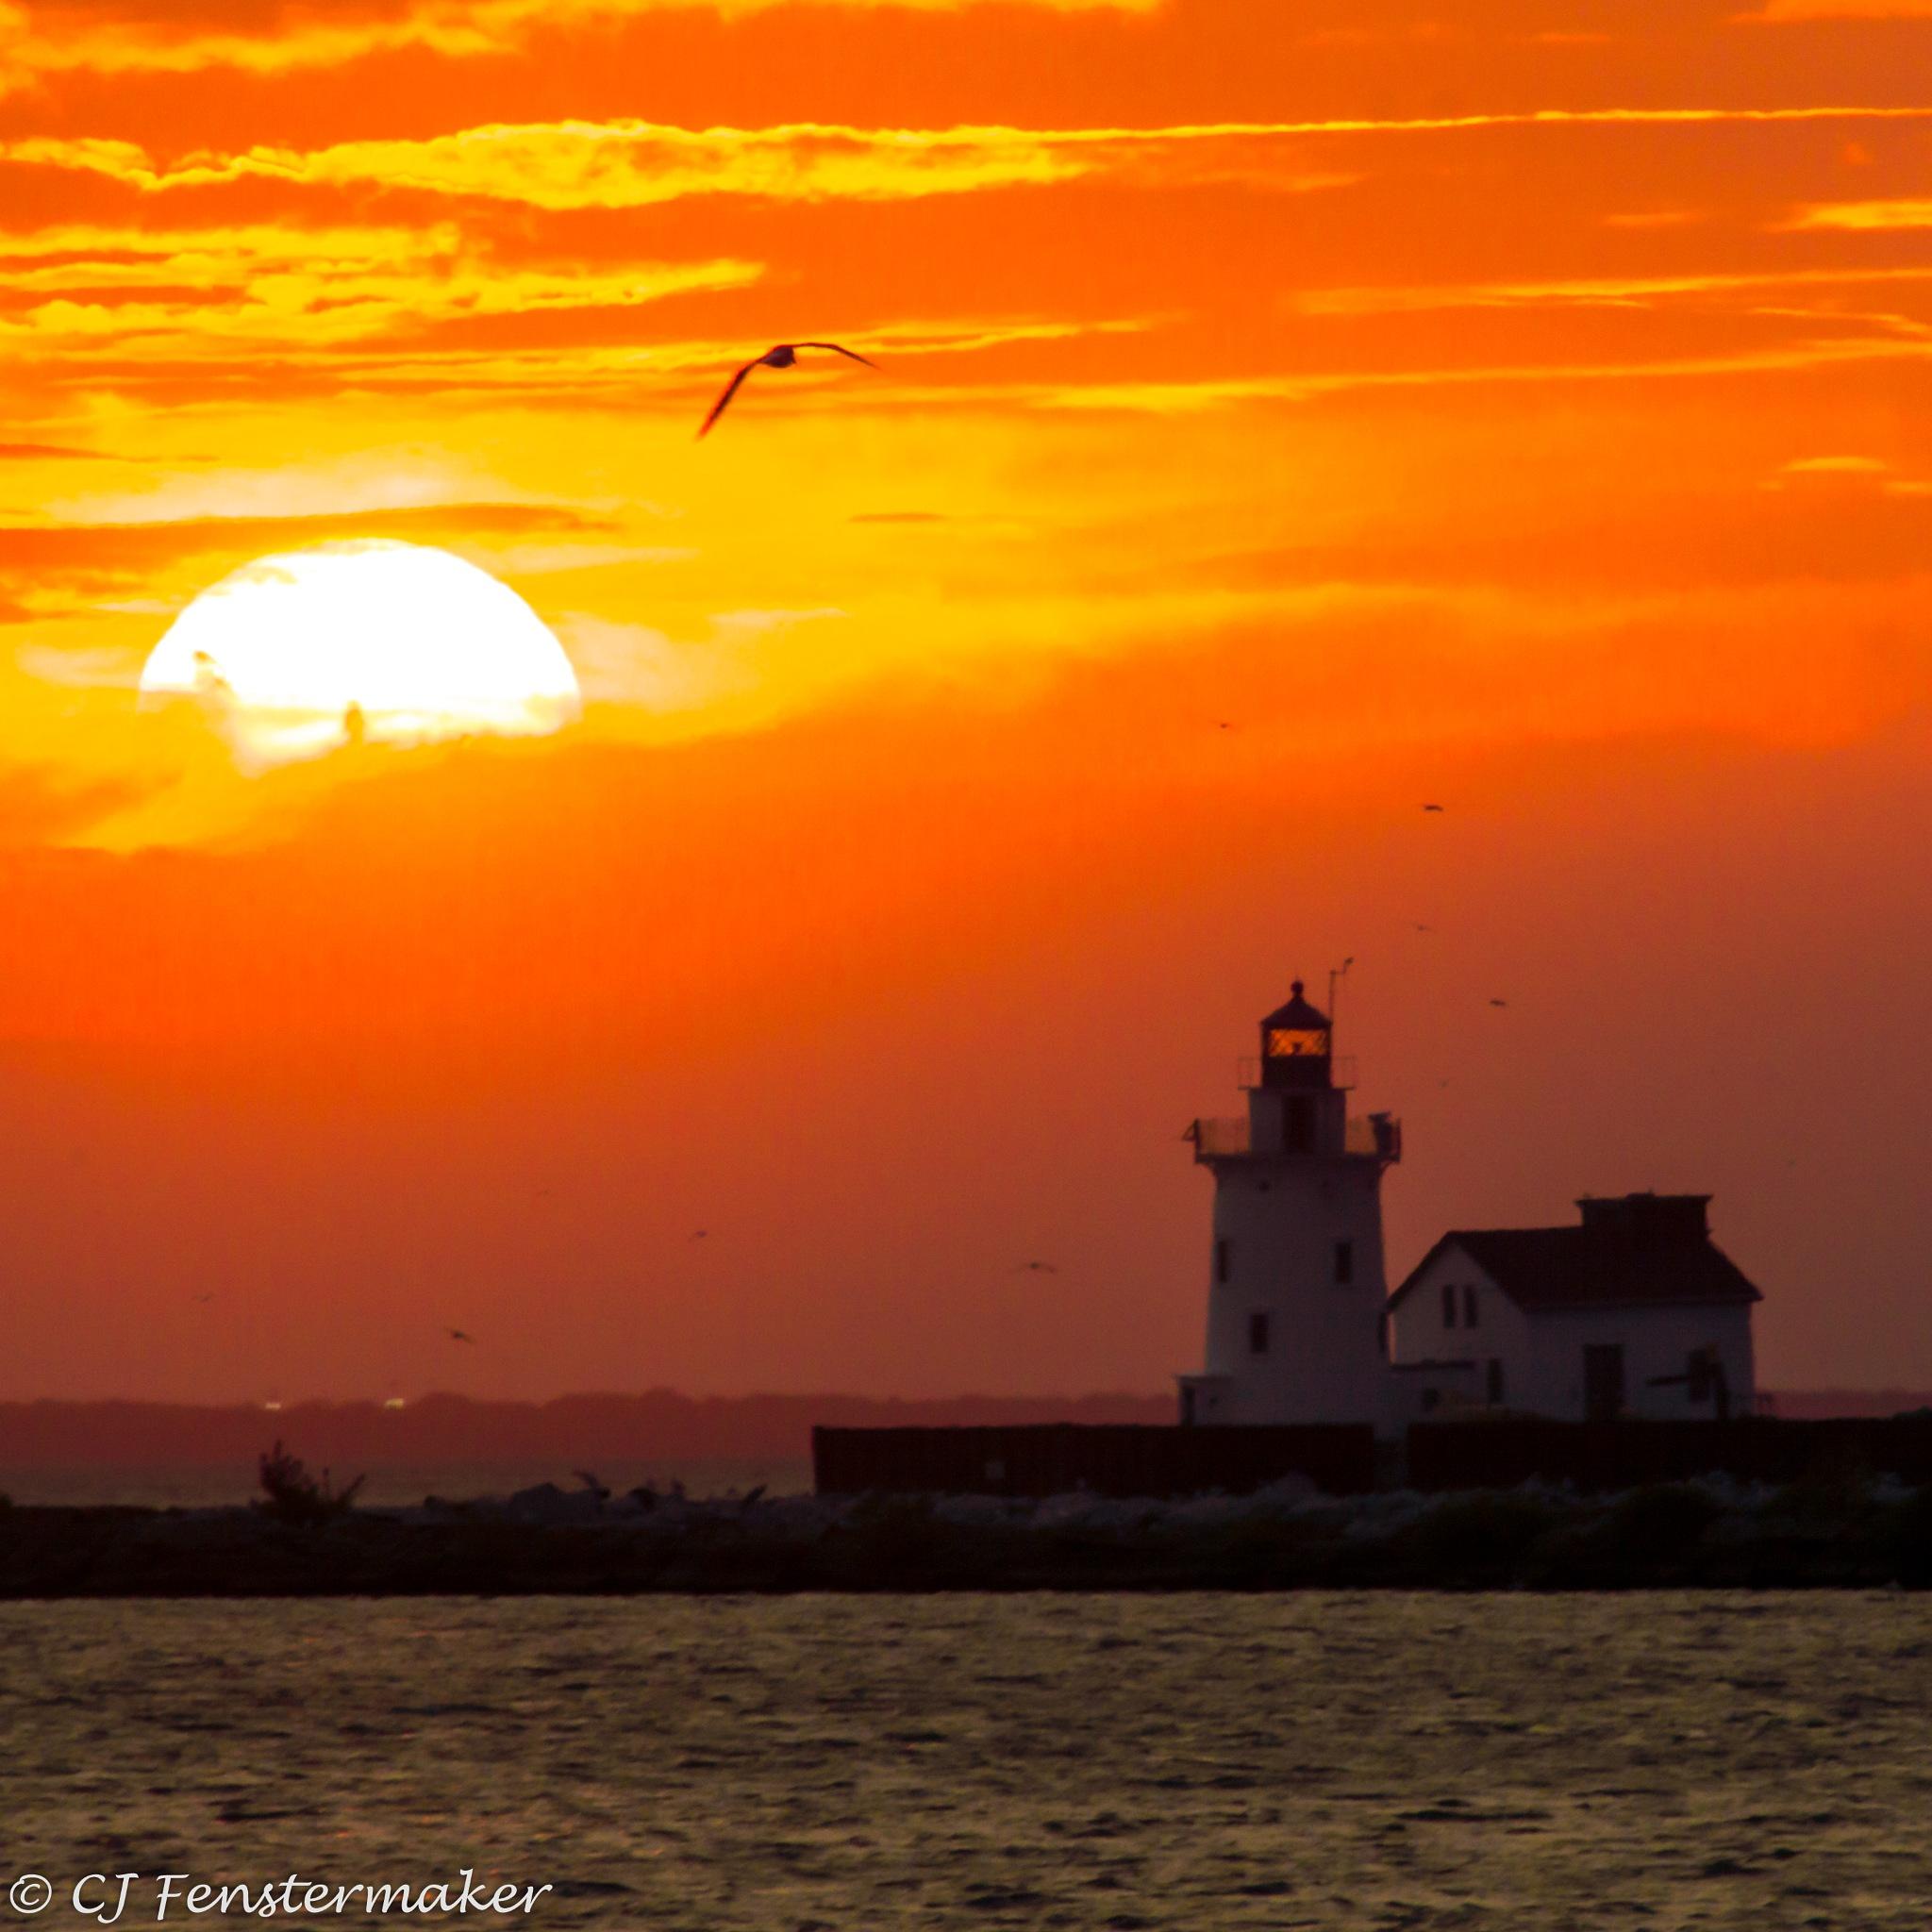 Cleveland Port Lighthouse by CJ Fenstermaker